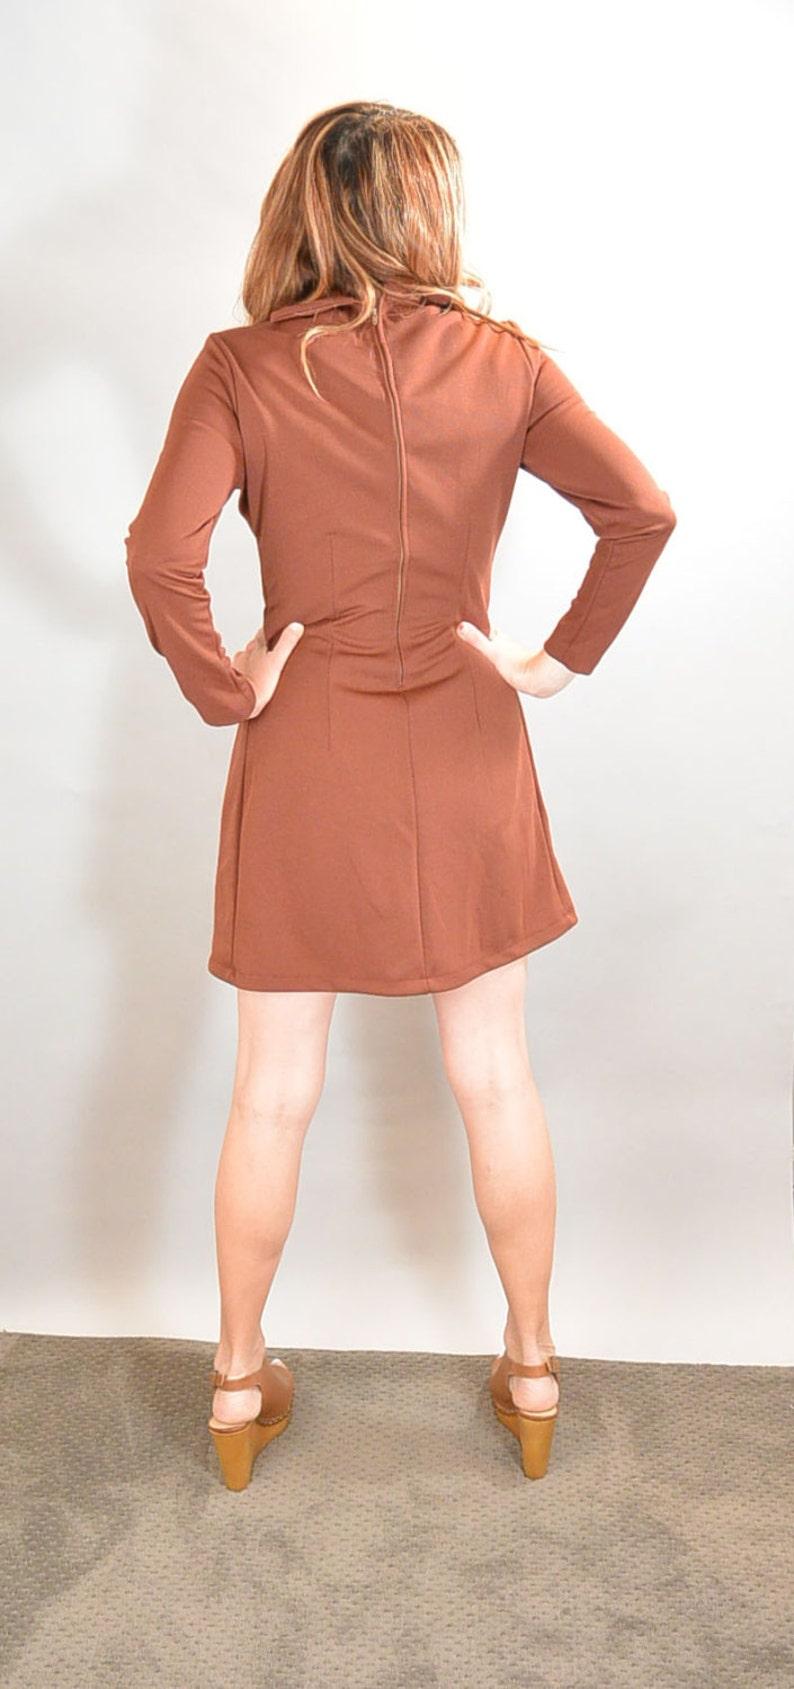 F1 60s Mod Brady Bunch Dress Mini Shift Dress Gogo Dancer Dress